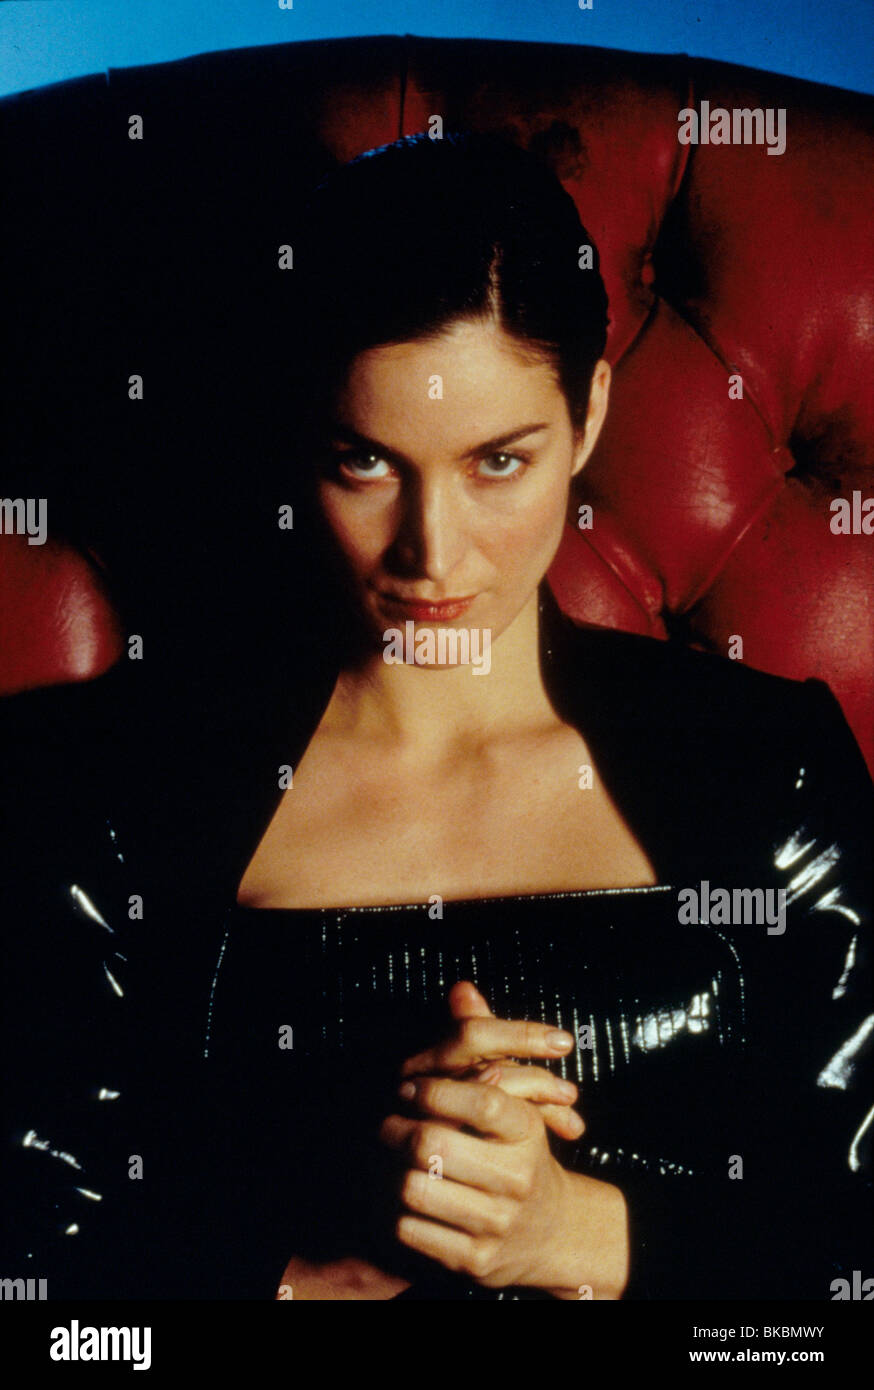 THE MATRIX (1999) CARRIE-ANNE MOSS MTIX 063 - Stock Image